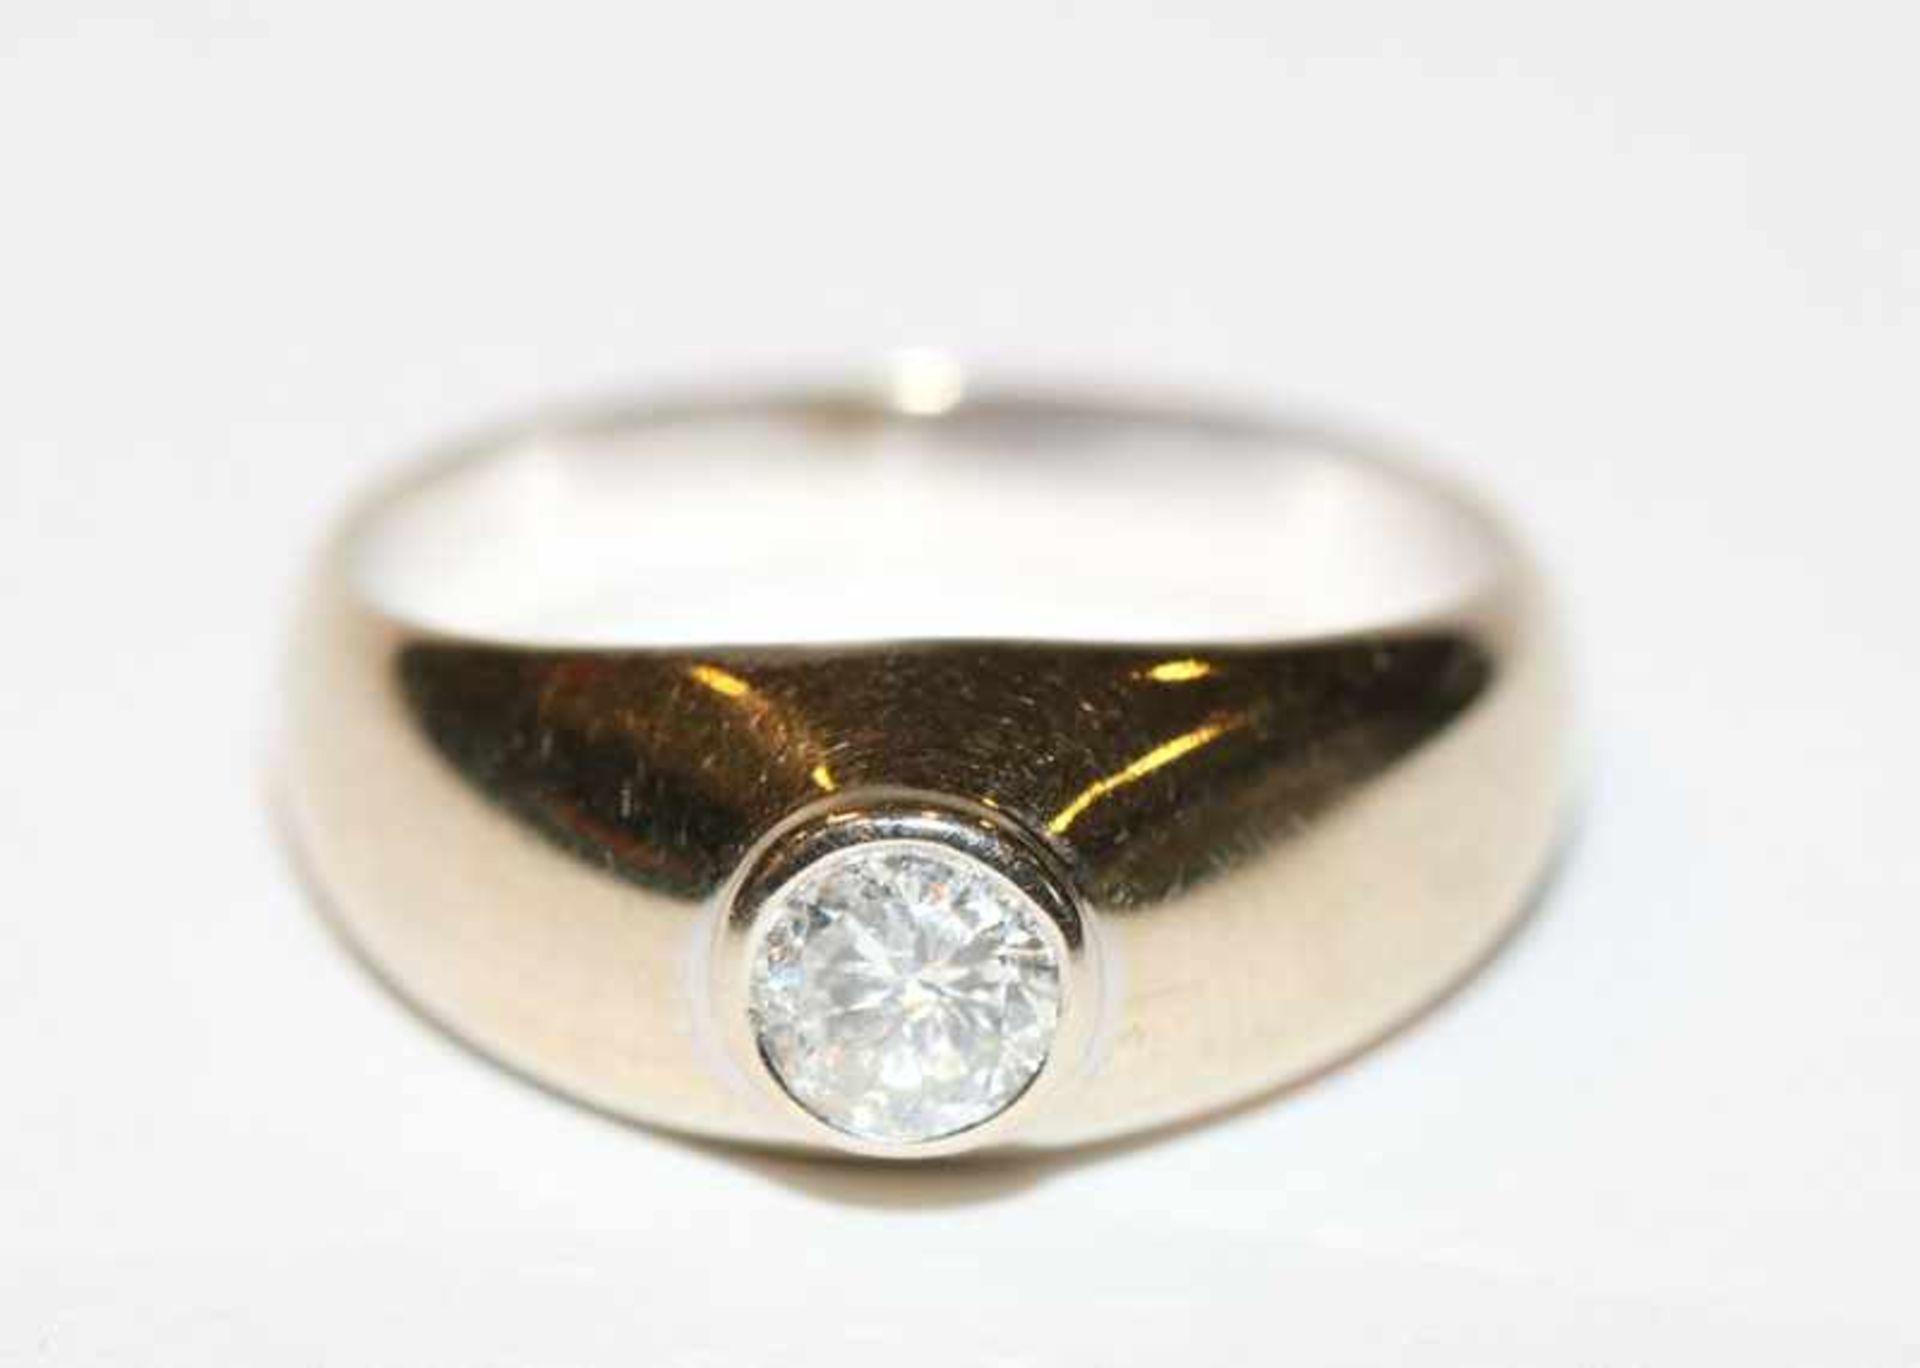 Los 35 - 14 k Gelbgold Ring mit ca. 0,40 ct. Diamant, Gr. 59